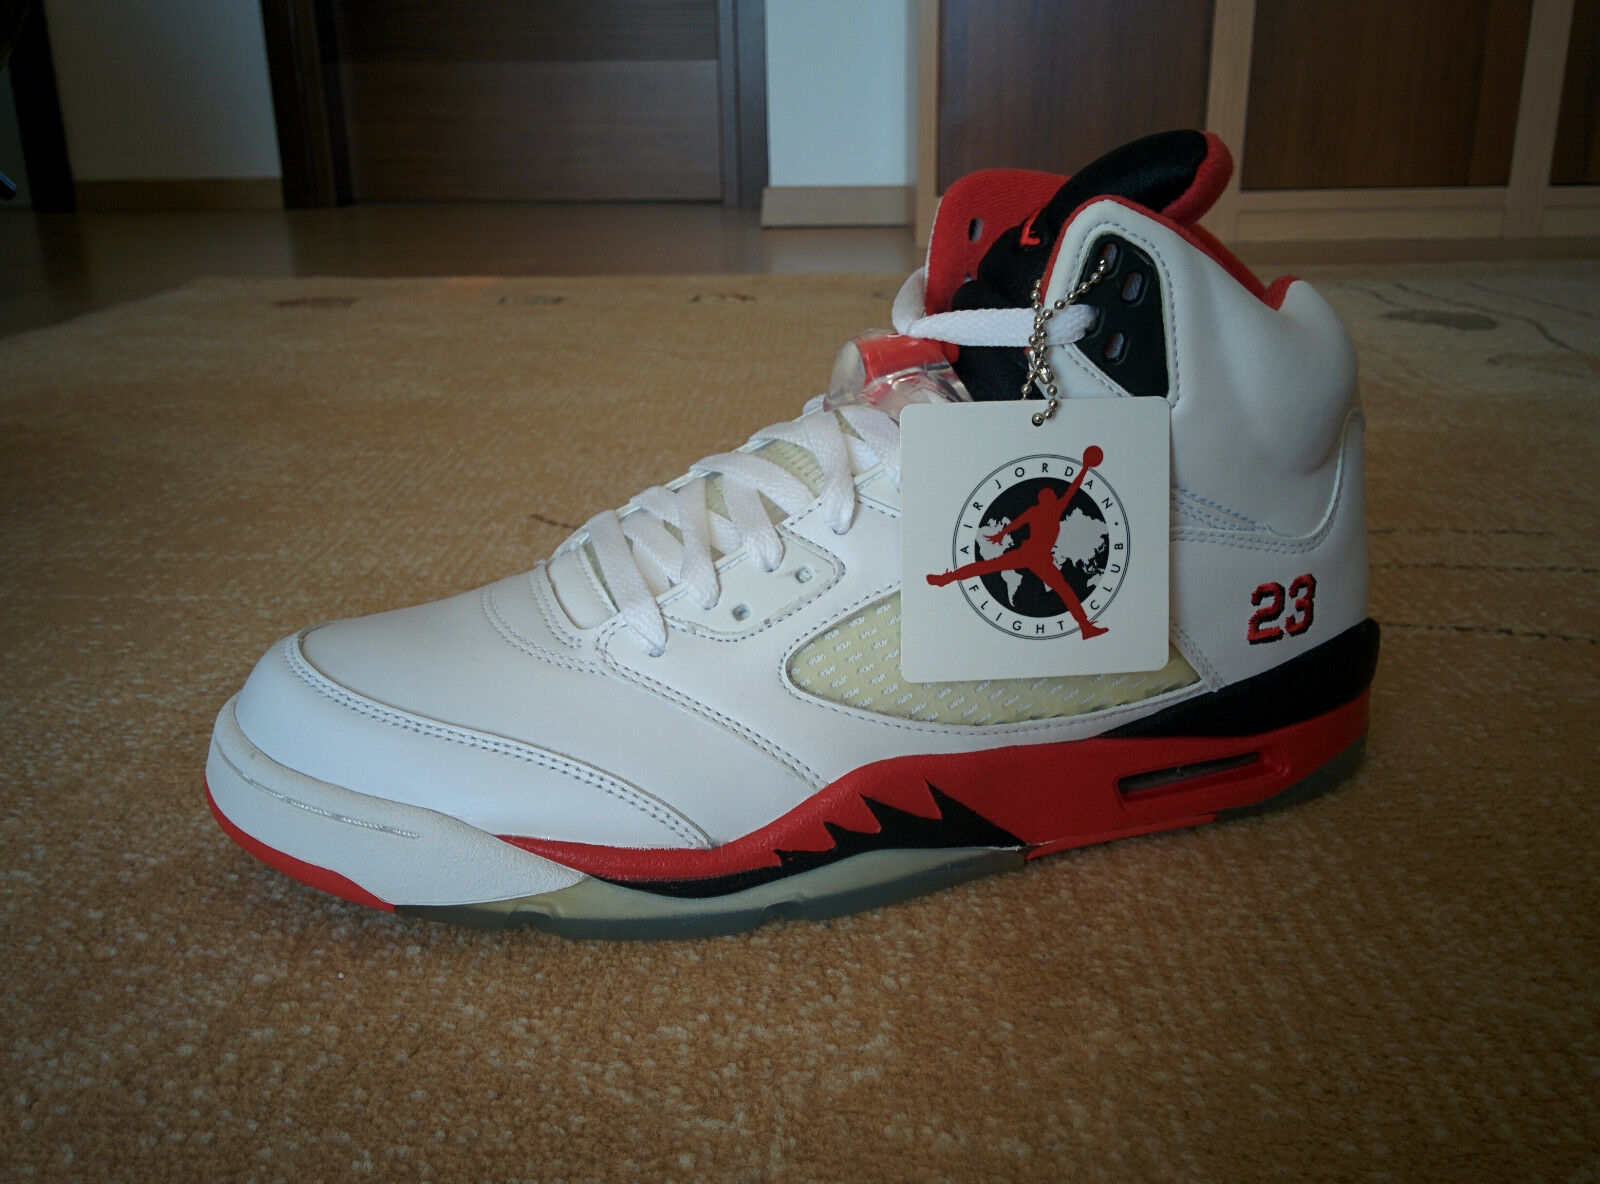 Nike Air Jordan 5 Retro Fire Reds-White-Fire Red-Black